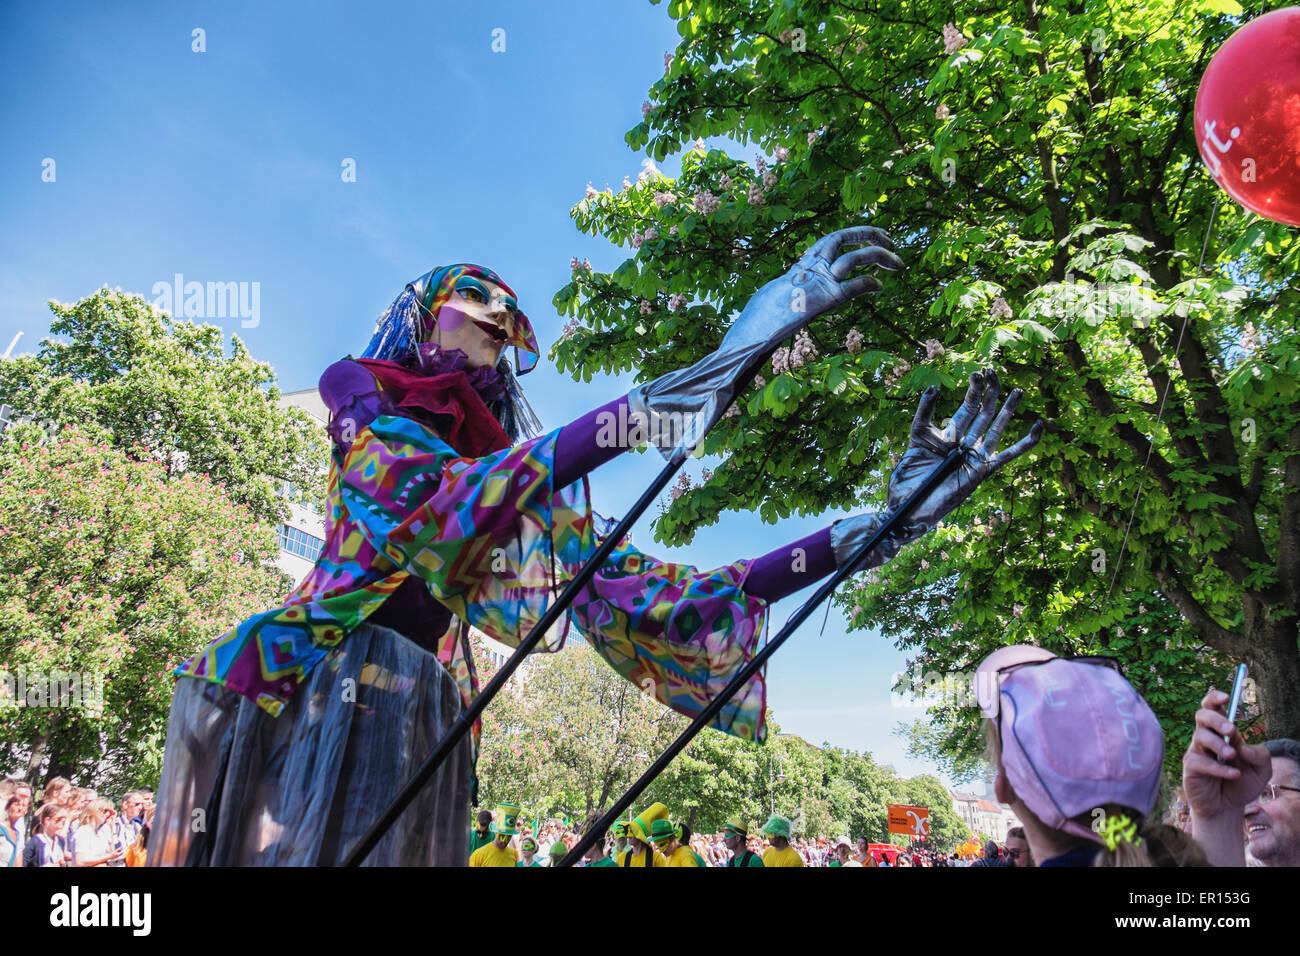 Kreuzberg, Berlín, Alemania, 24 de mayo de 2015. Jugadores con el tall Fancy Dress costume capturas globo Berlín Imagen De Stock